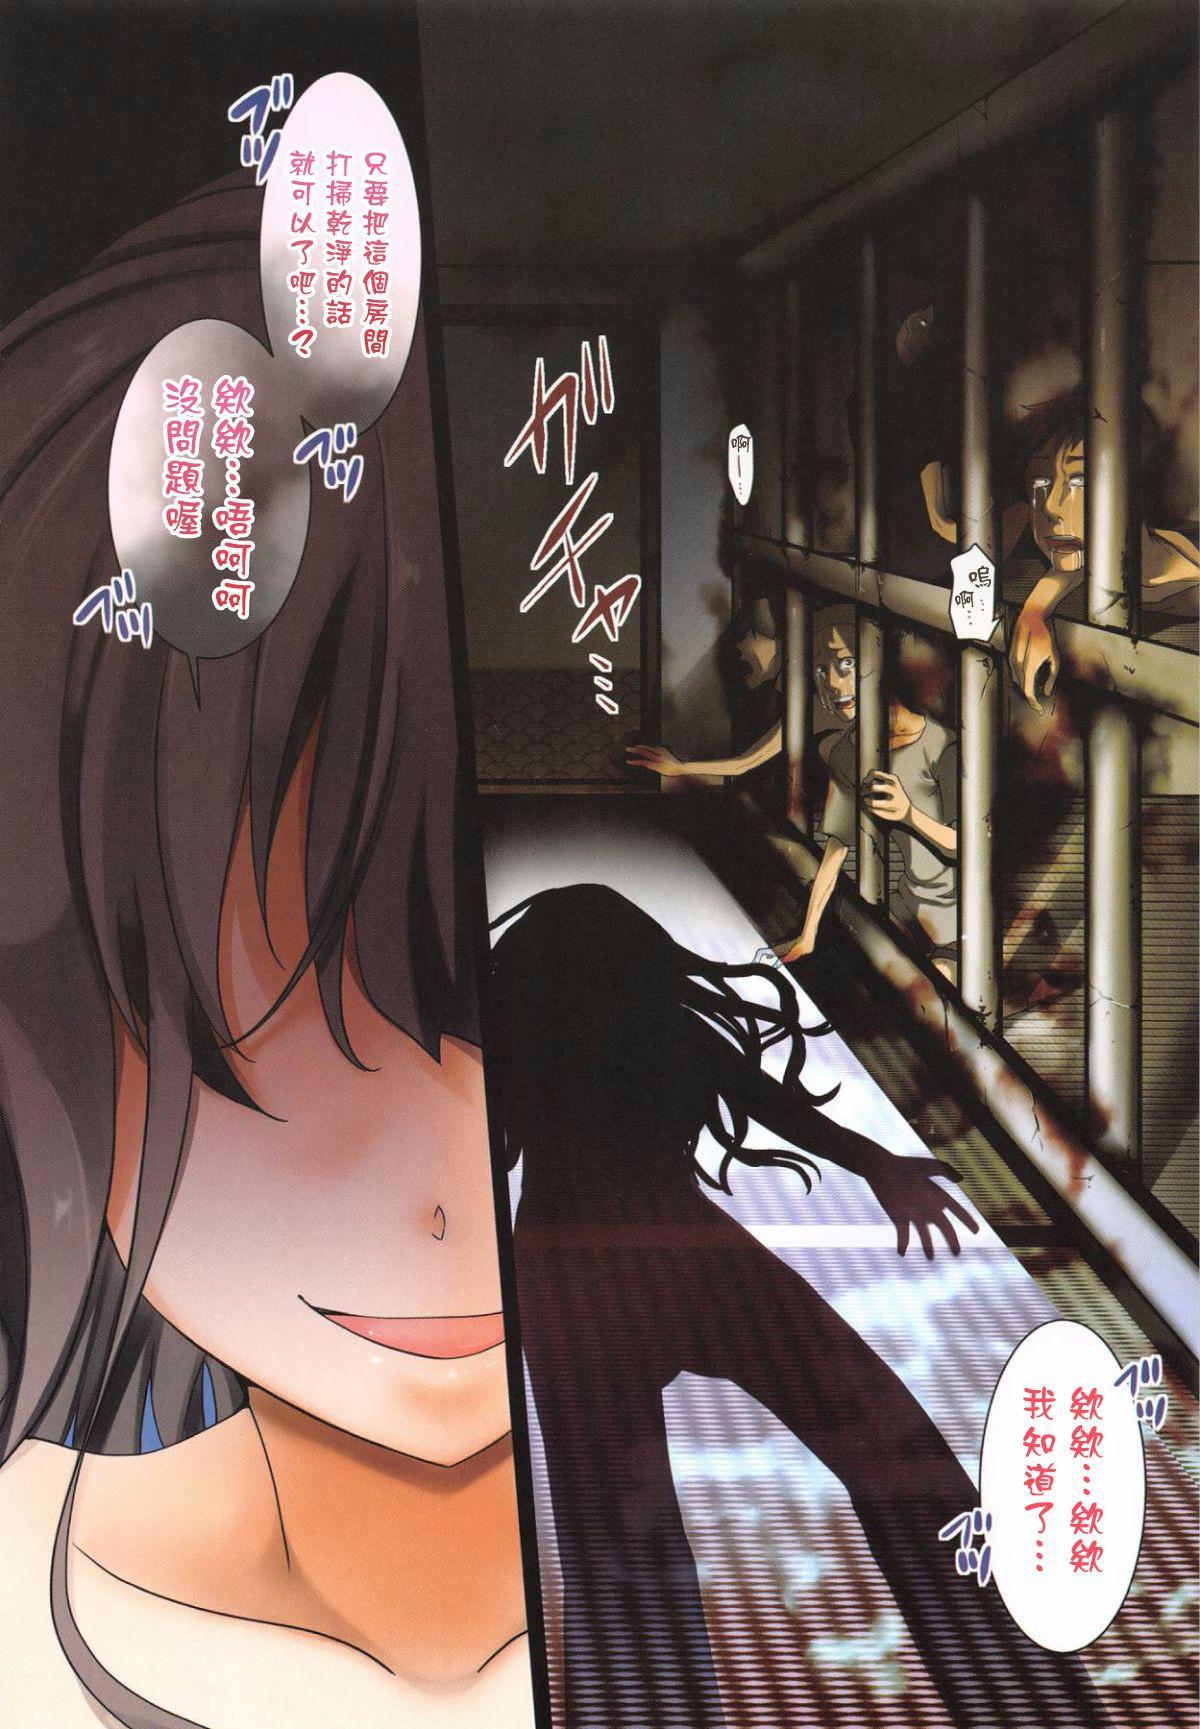 [hal] Daienjou -Ikare Ikasare Iki Ikare-   ∞艶嬢 -洩出來被搞到洩掛了被搞掛-  [Chinese] 207